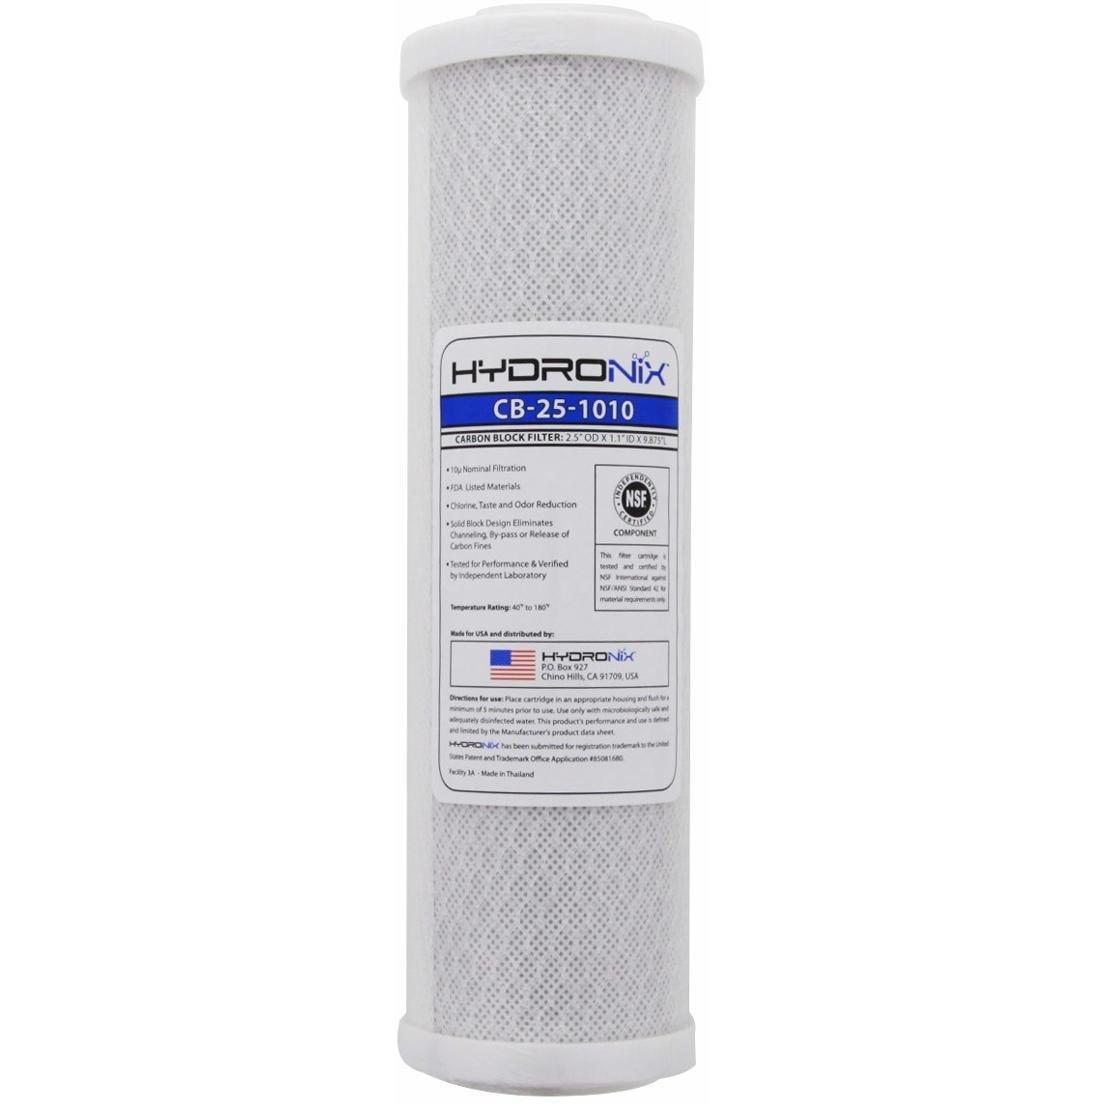 Hydronix CB-25-1010 NSF Carbon Block Filter 2.5-Inch OD X 9 7/8-Inch Length, 10 Micron